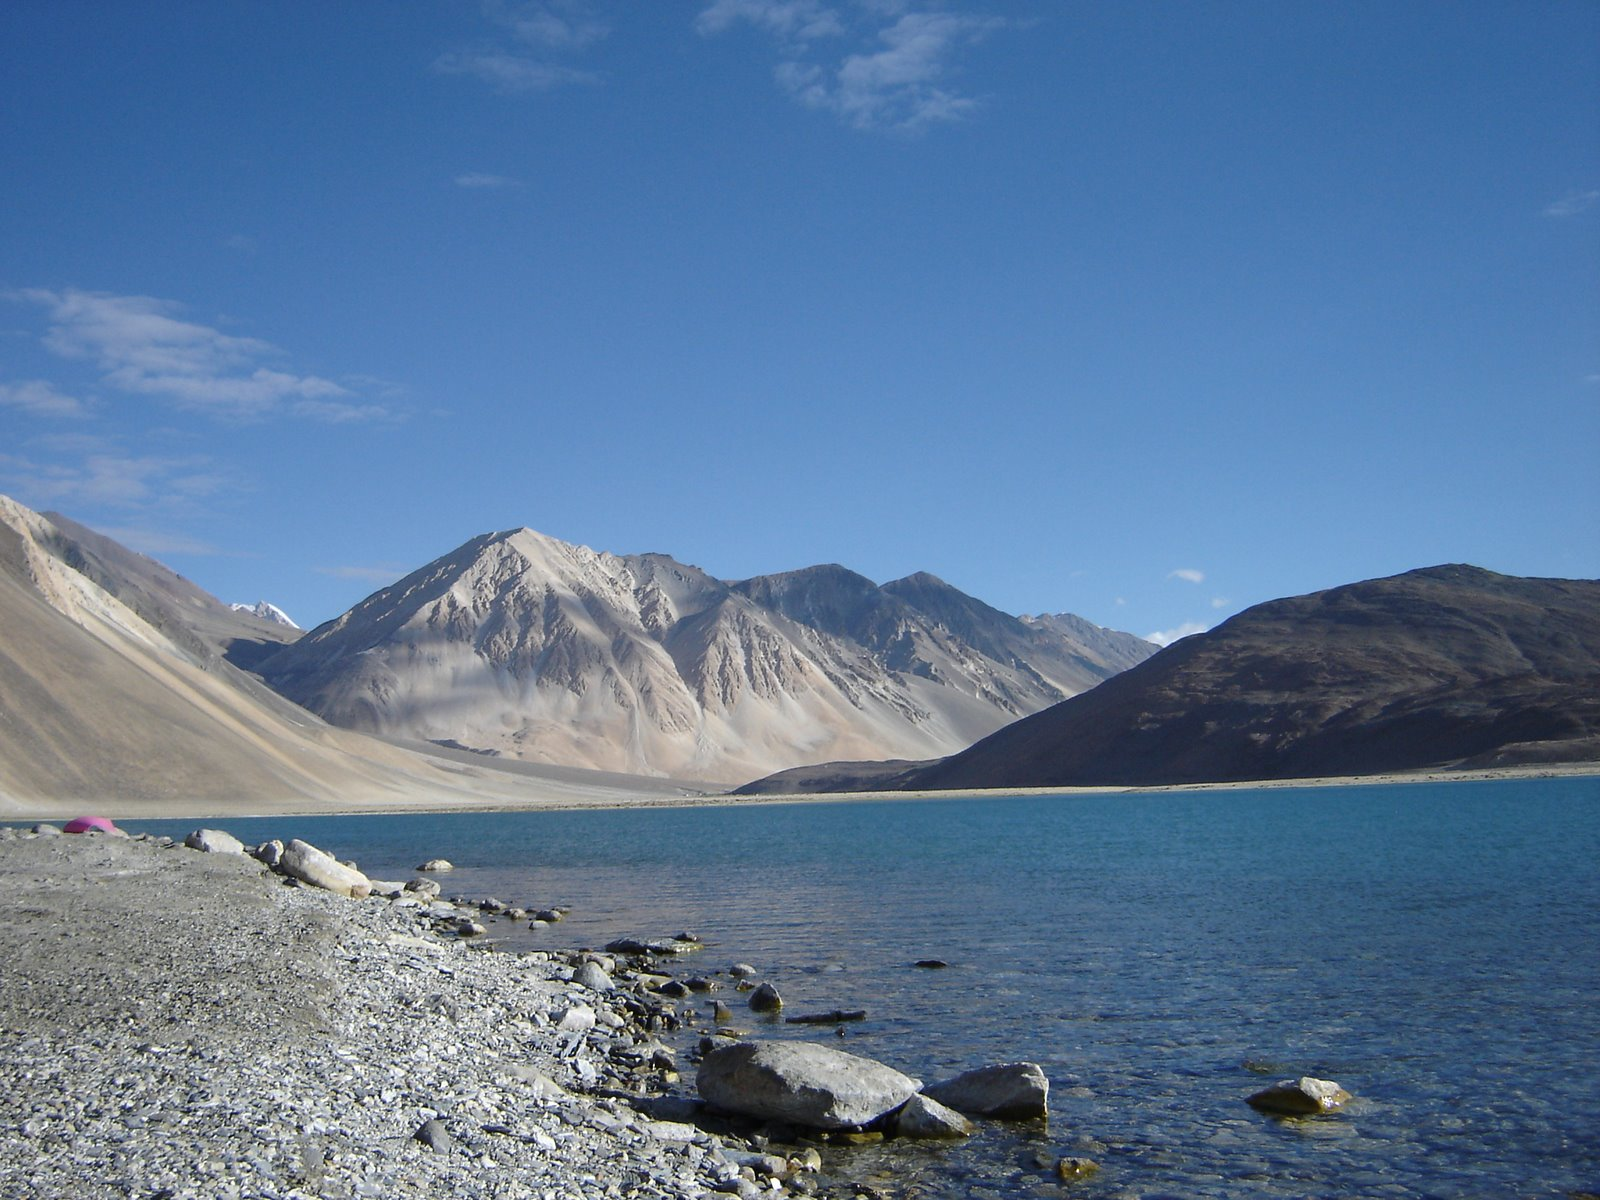 Ladakh, What else - Ghumakkar - Inspiring travel experiences.